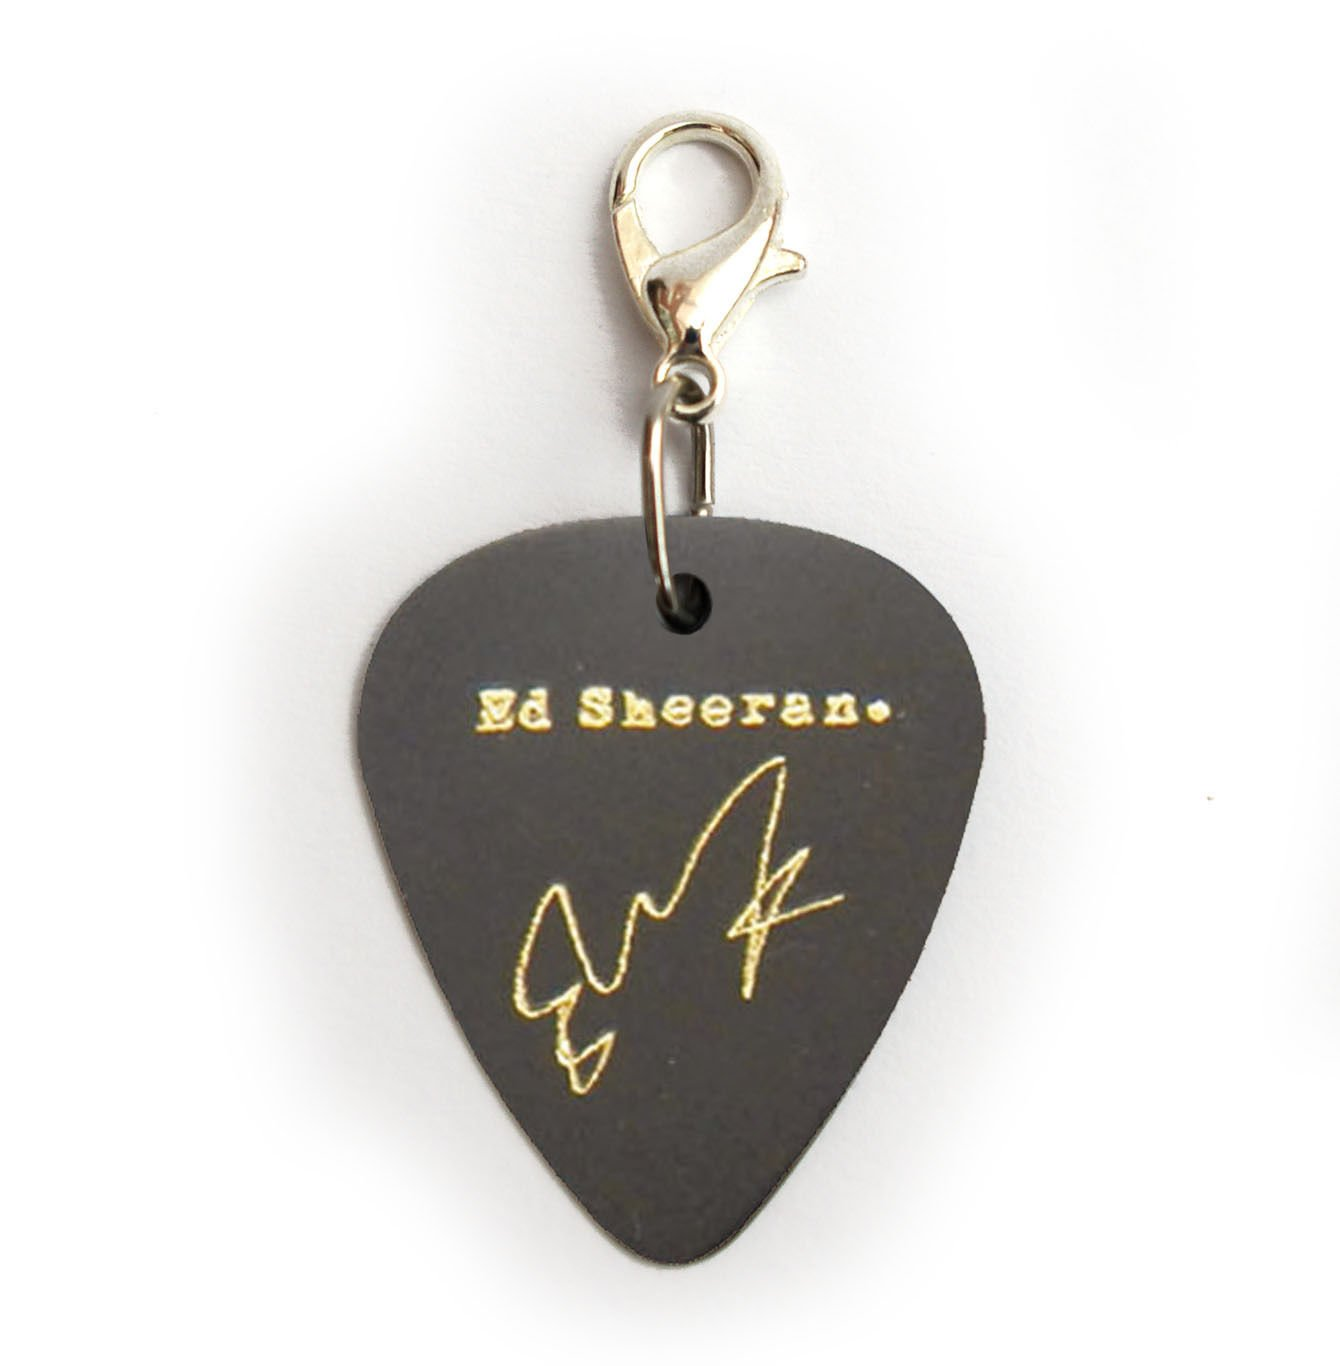 ED SHEERAN Signature Guitar Pick Plectrum necklace bracelet keyring Earrings pin(Charm A): Amazon.es: Instrumentos musicales